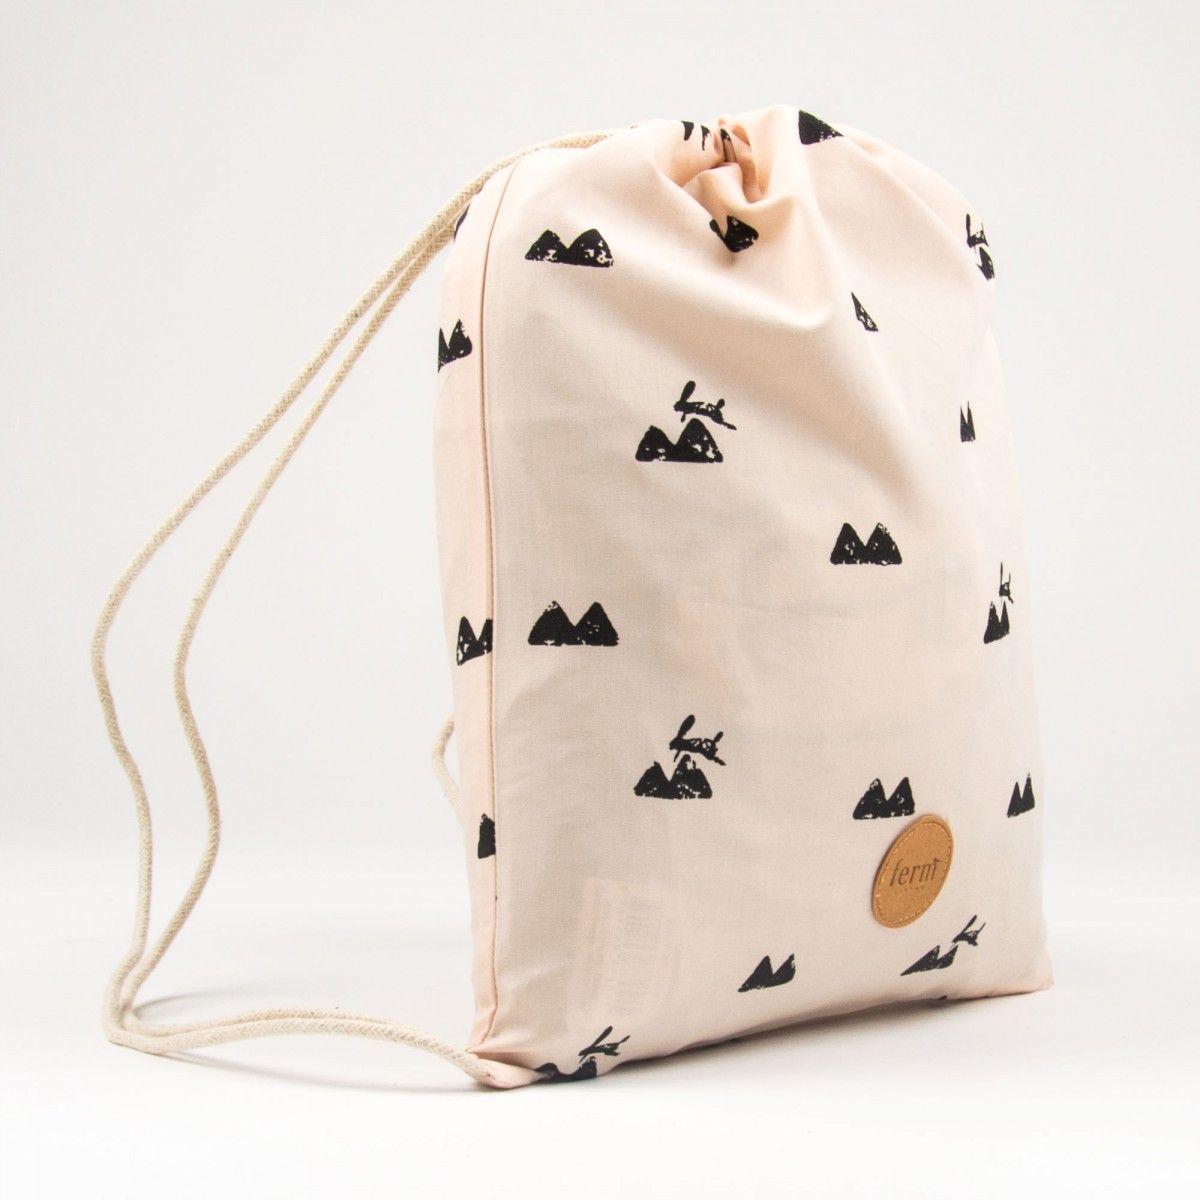 be7e0c3b0fd38b ferm LIVING kids Rose Gym Bag with Rabbit Print | * Gift Ideas under ...